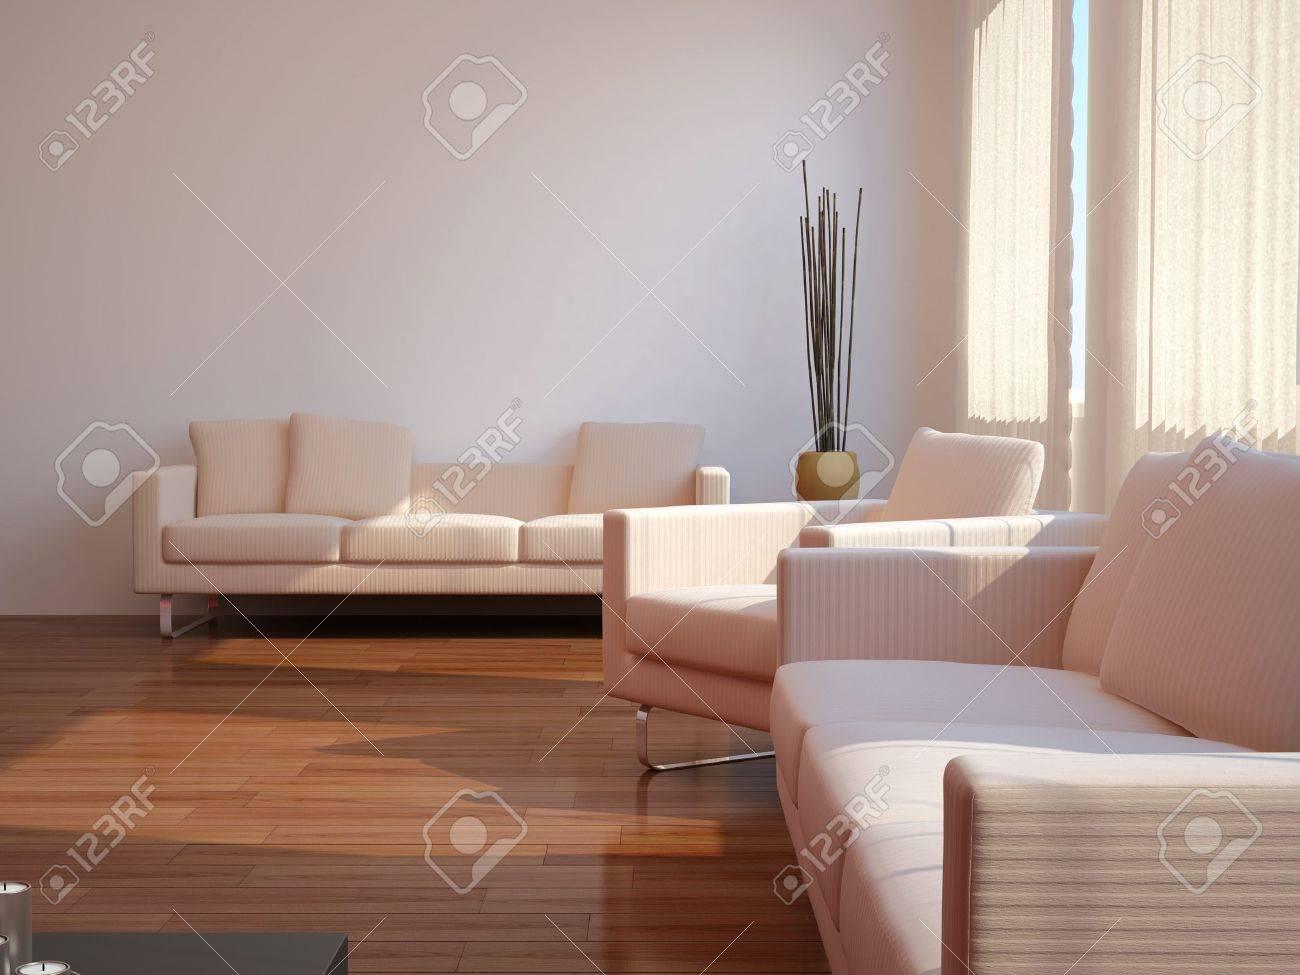 High Resolution Image Interior 3d Illustration Modern Living Room Stock